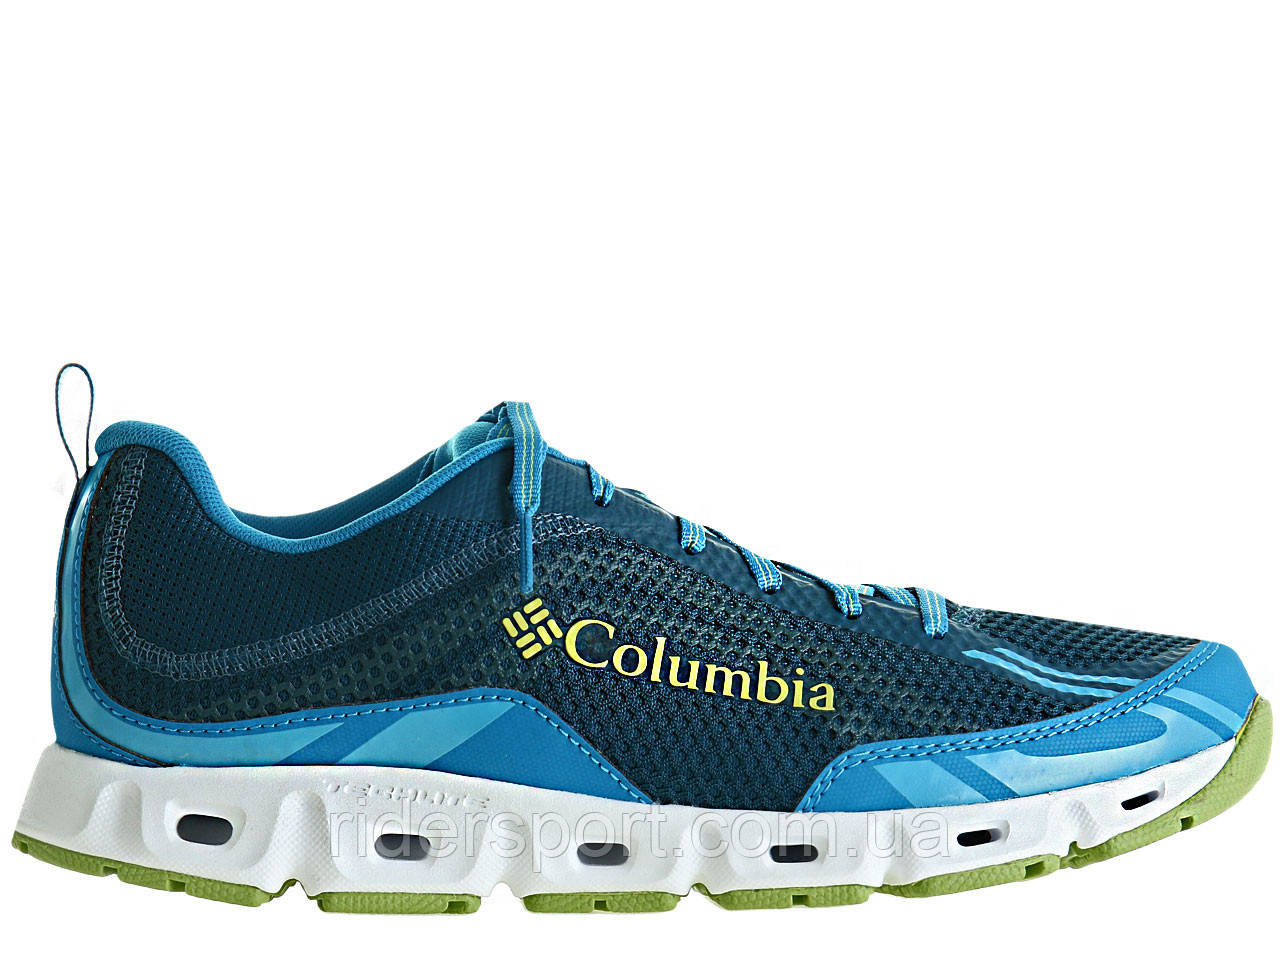 Мужские кроссовки Columbia Drainmaker IV (1767611-442) BM4617-442